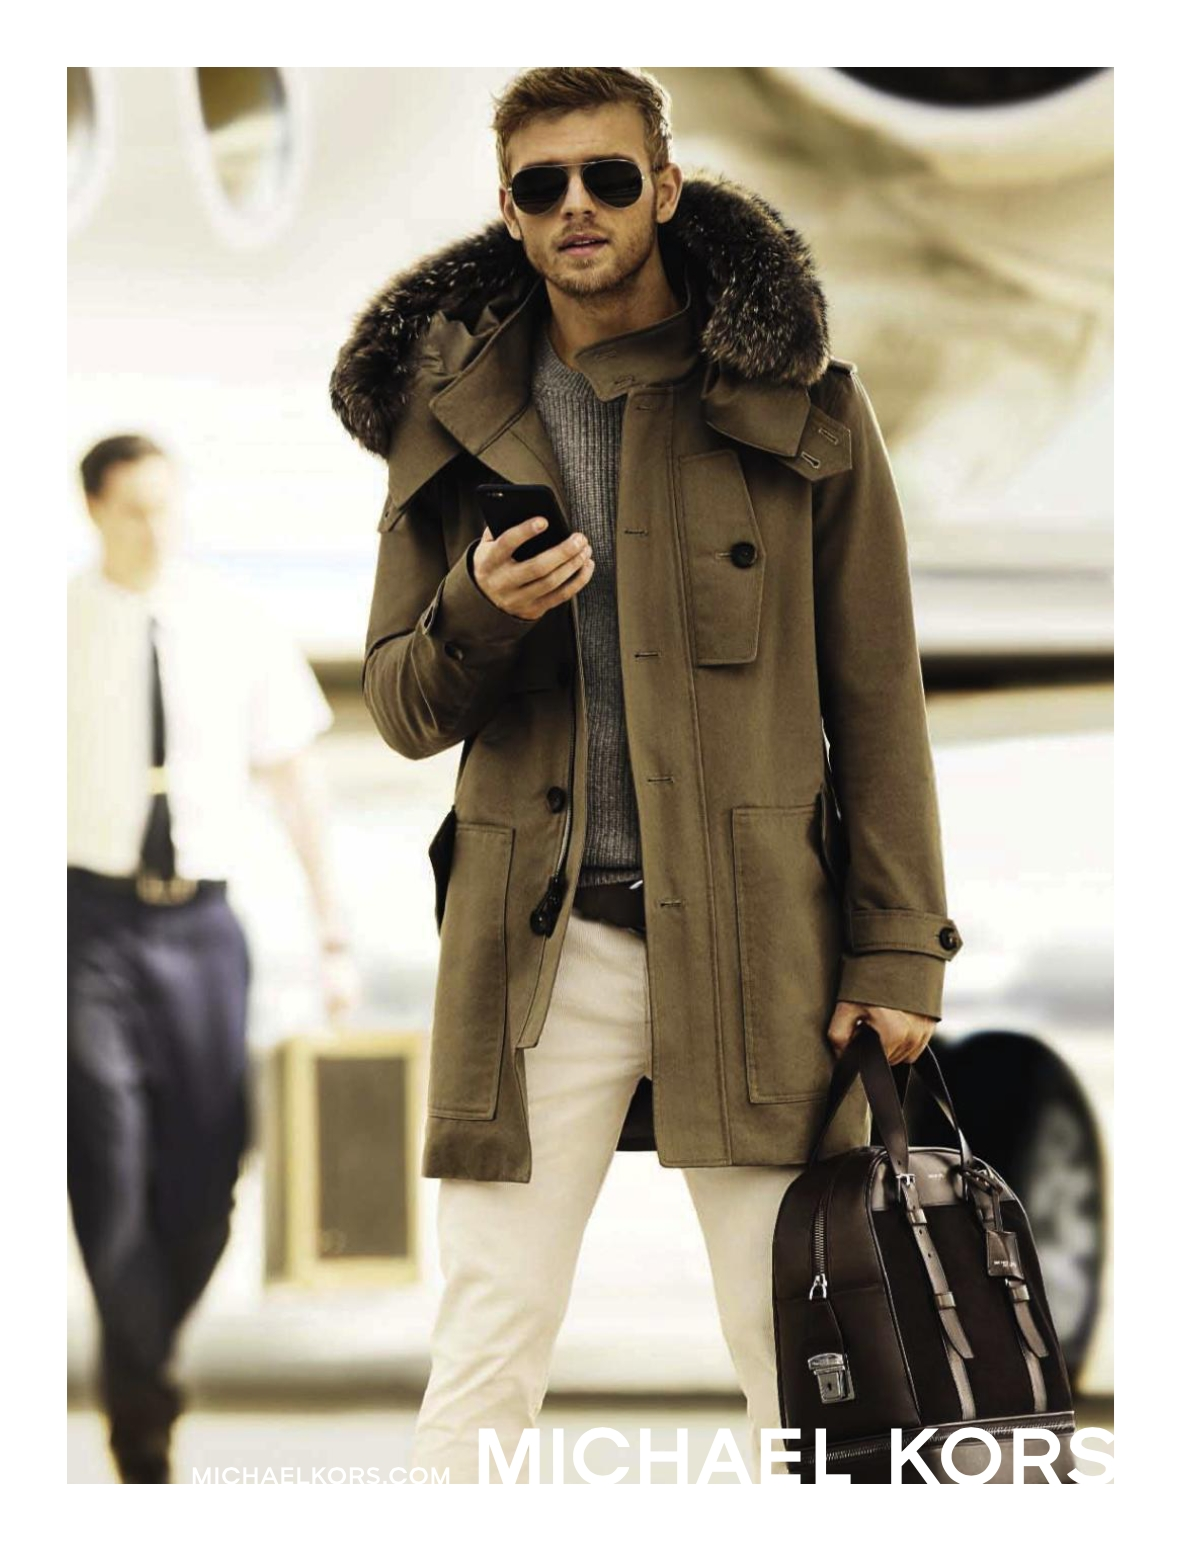 Benjamin Eidem Dons Duffle Coat for Michael Kors Fall/Winter 2015 Campaign